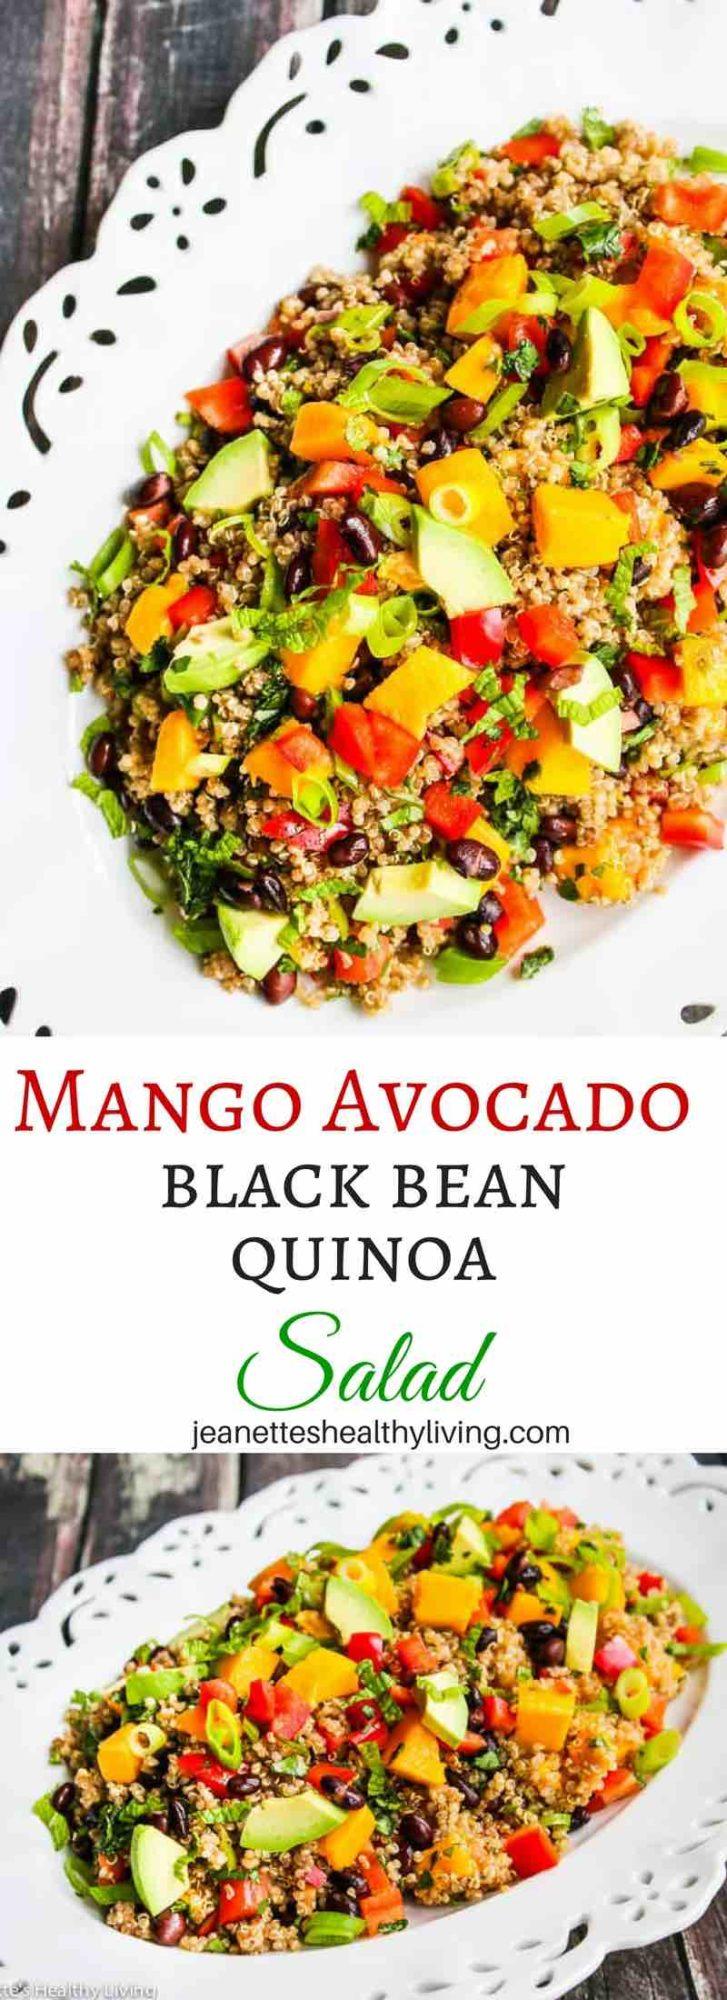 Mango Avocado Black Bean Quinoa Salad - this beautiful healthy salad is perfect for entertaining